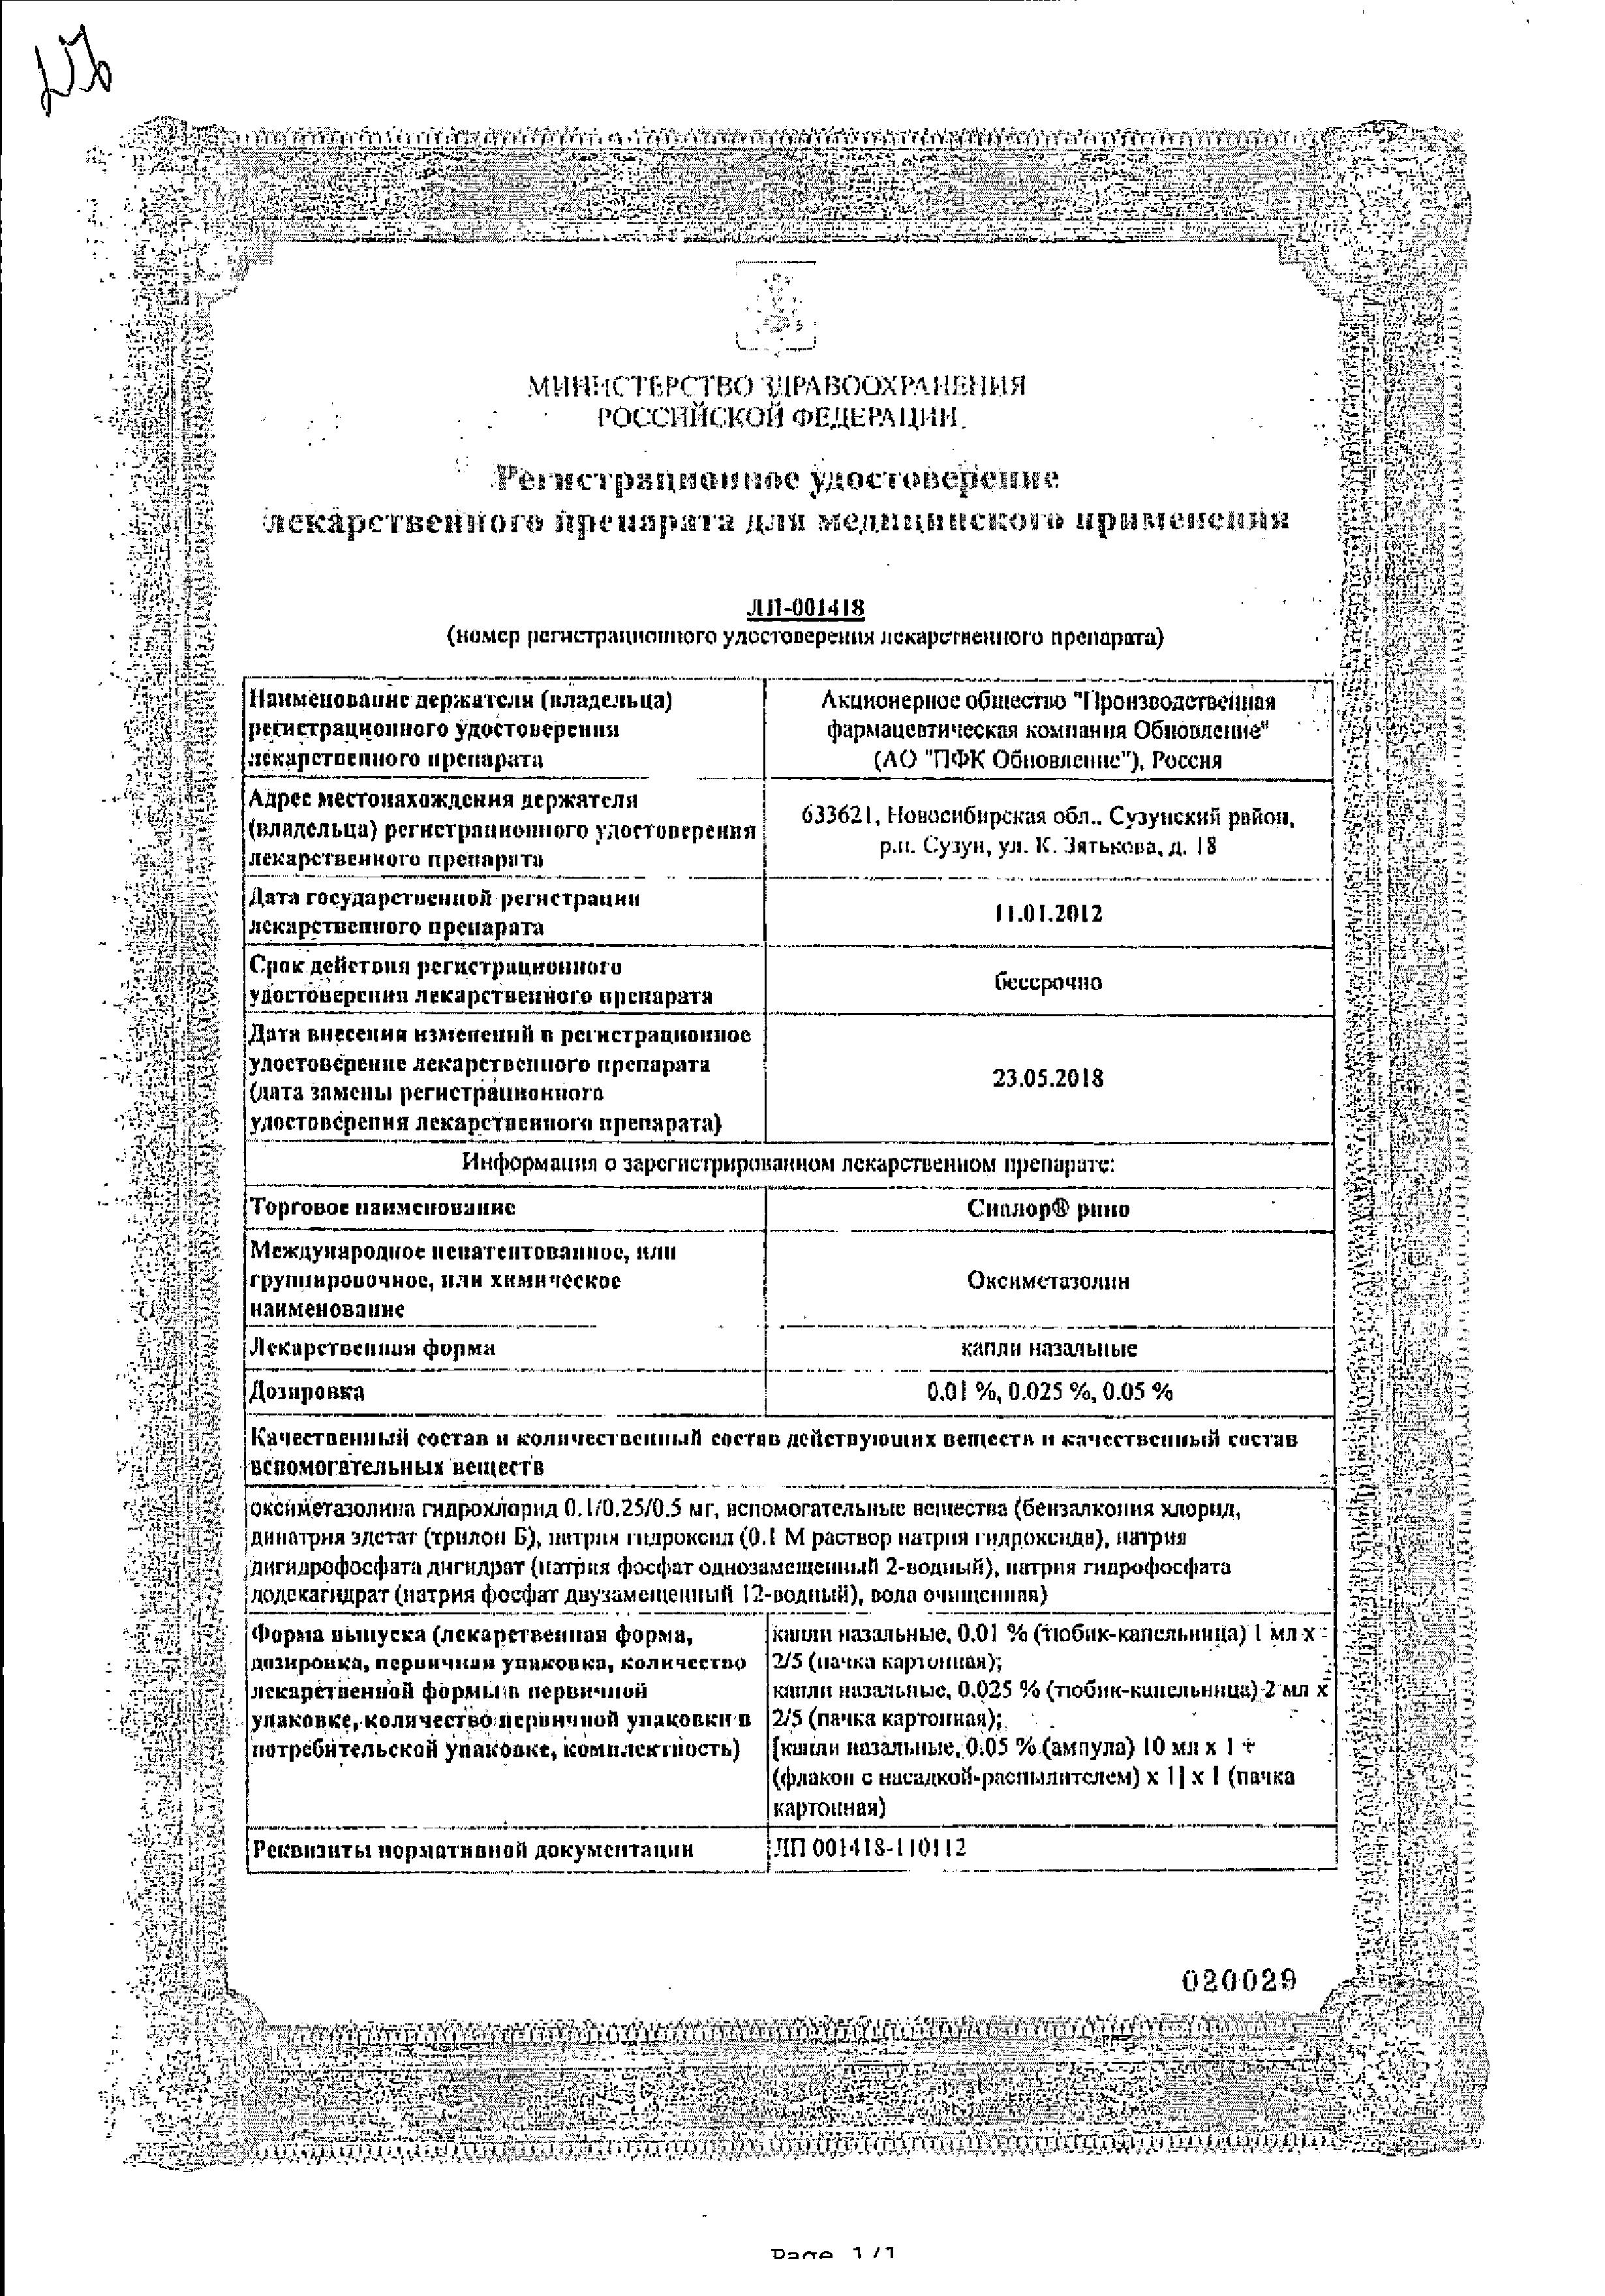 Сиалор рино сертификат